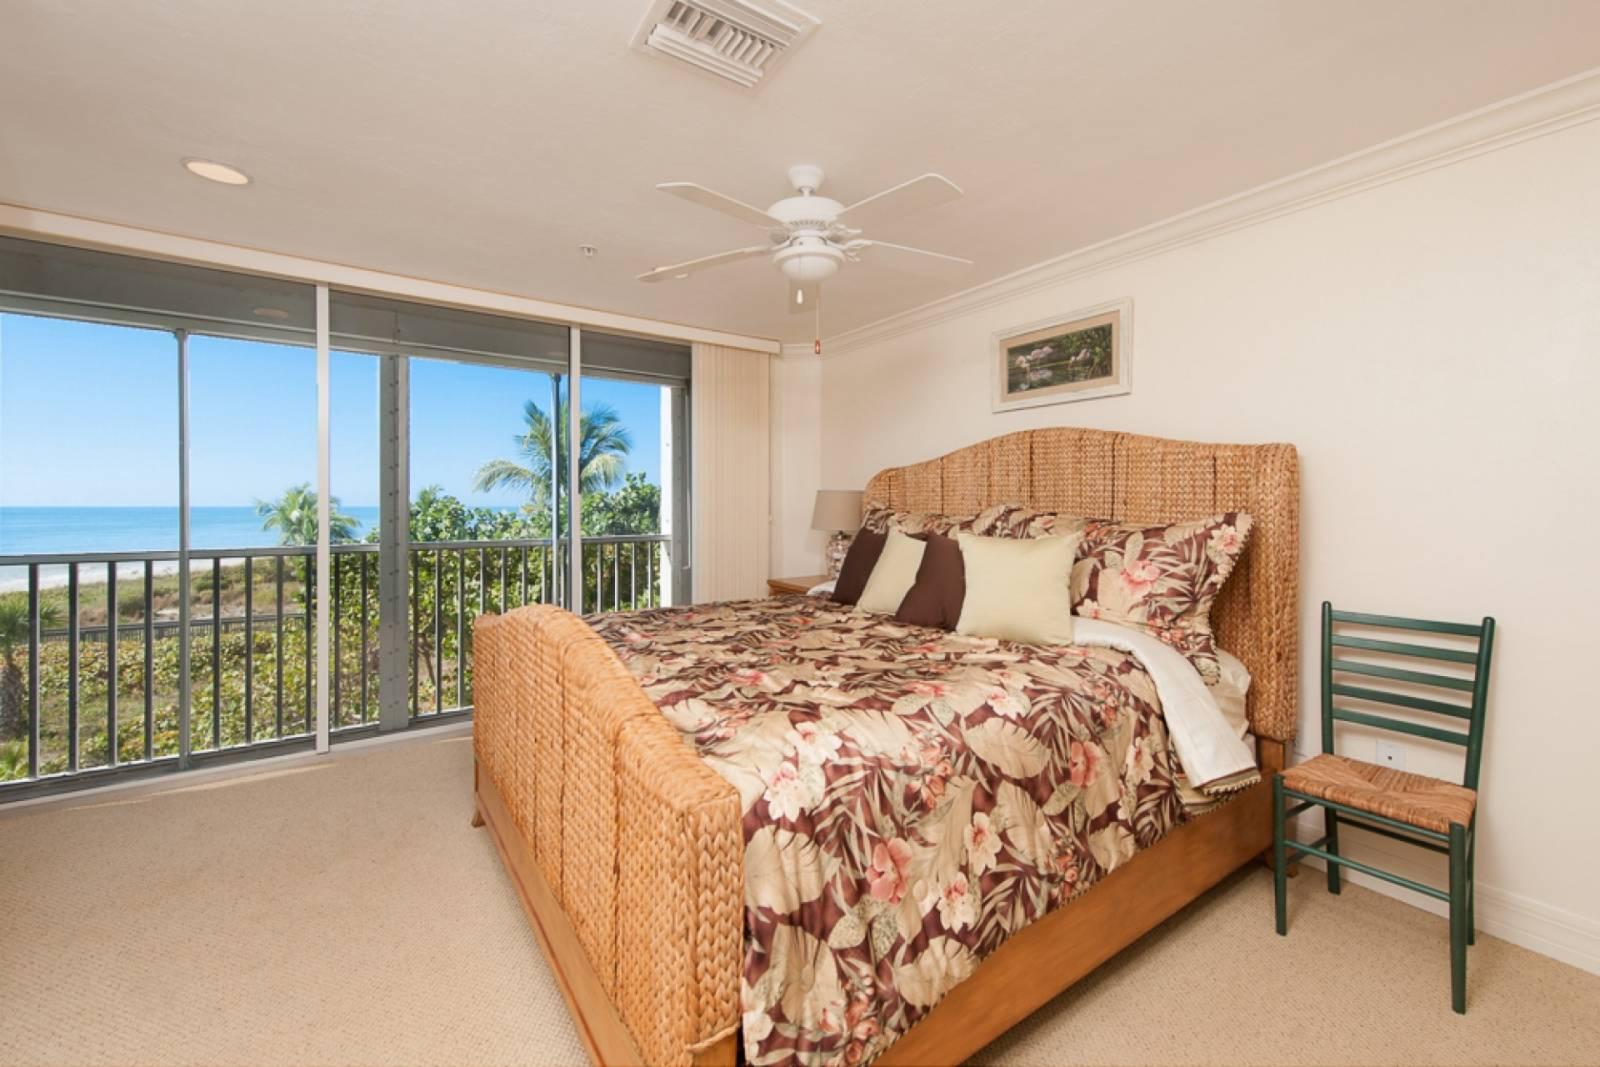 Kimball Bedroom Furniture Sanibel Vacation Rental Beautiful Gulf Views Lovely Kimball